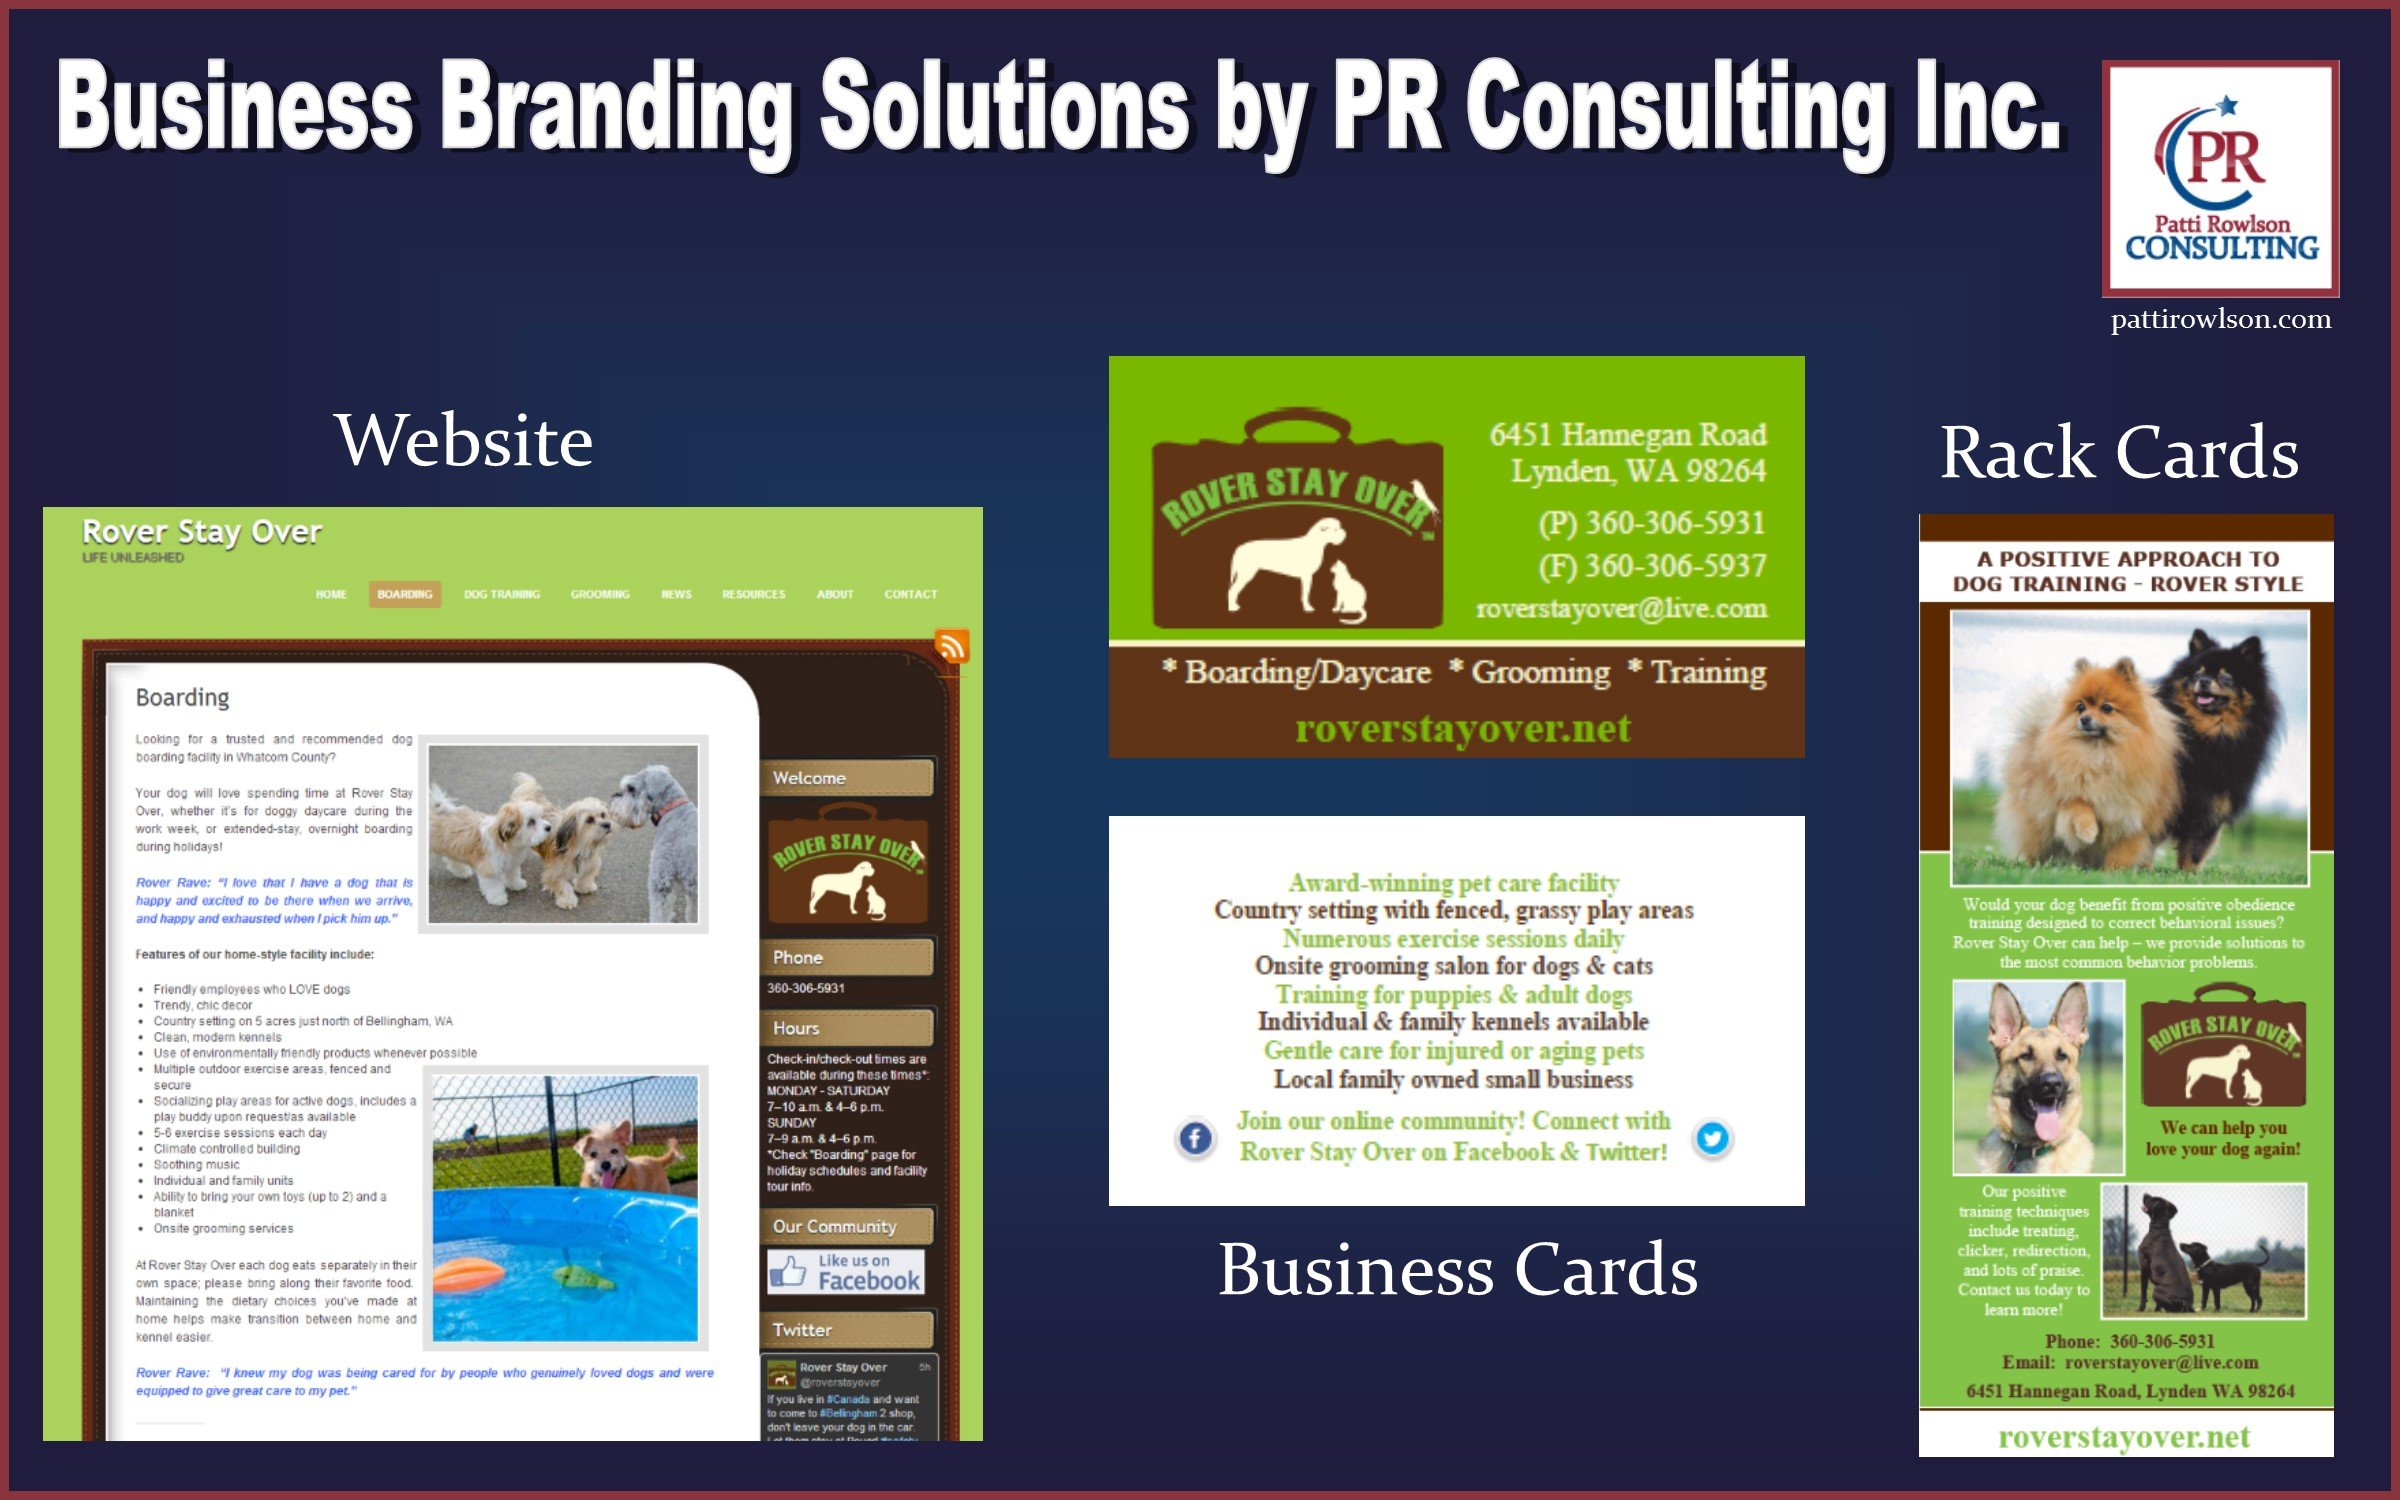 prehensive branding materials